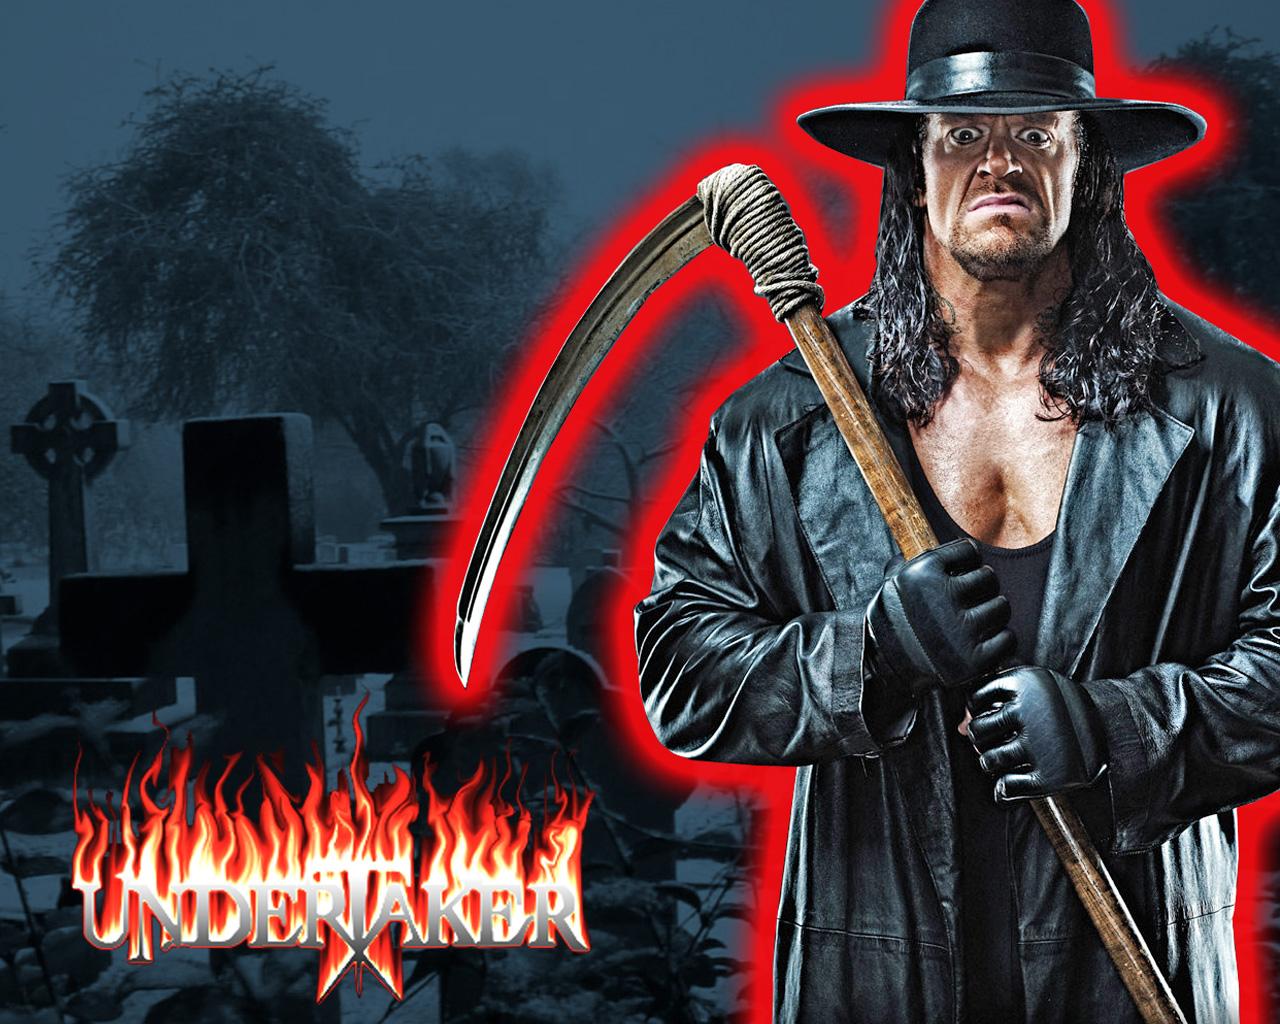 undertaker wwe superstarUndertaker Wwe Superstar